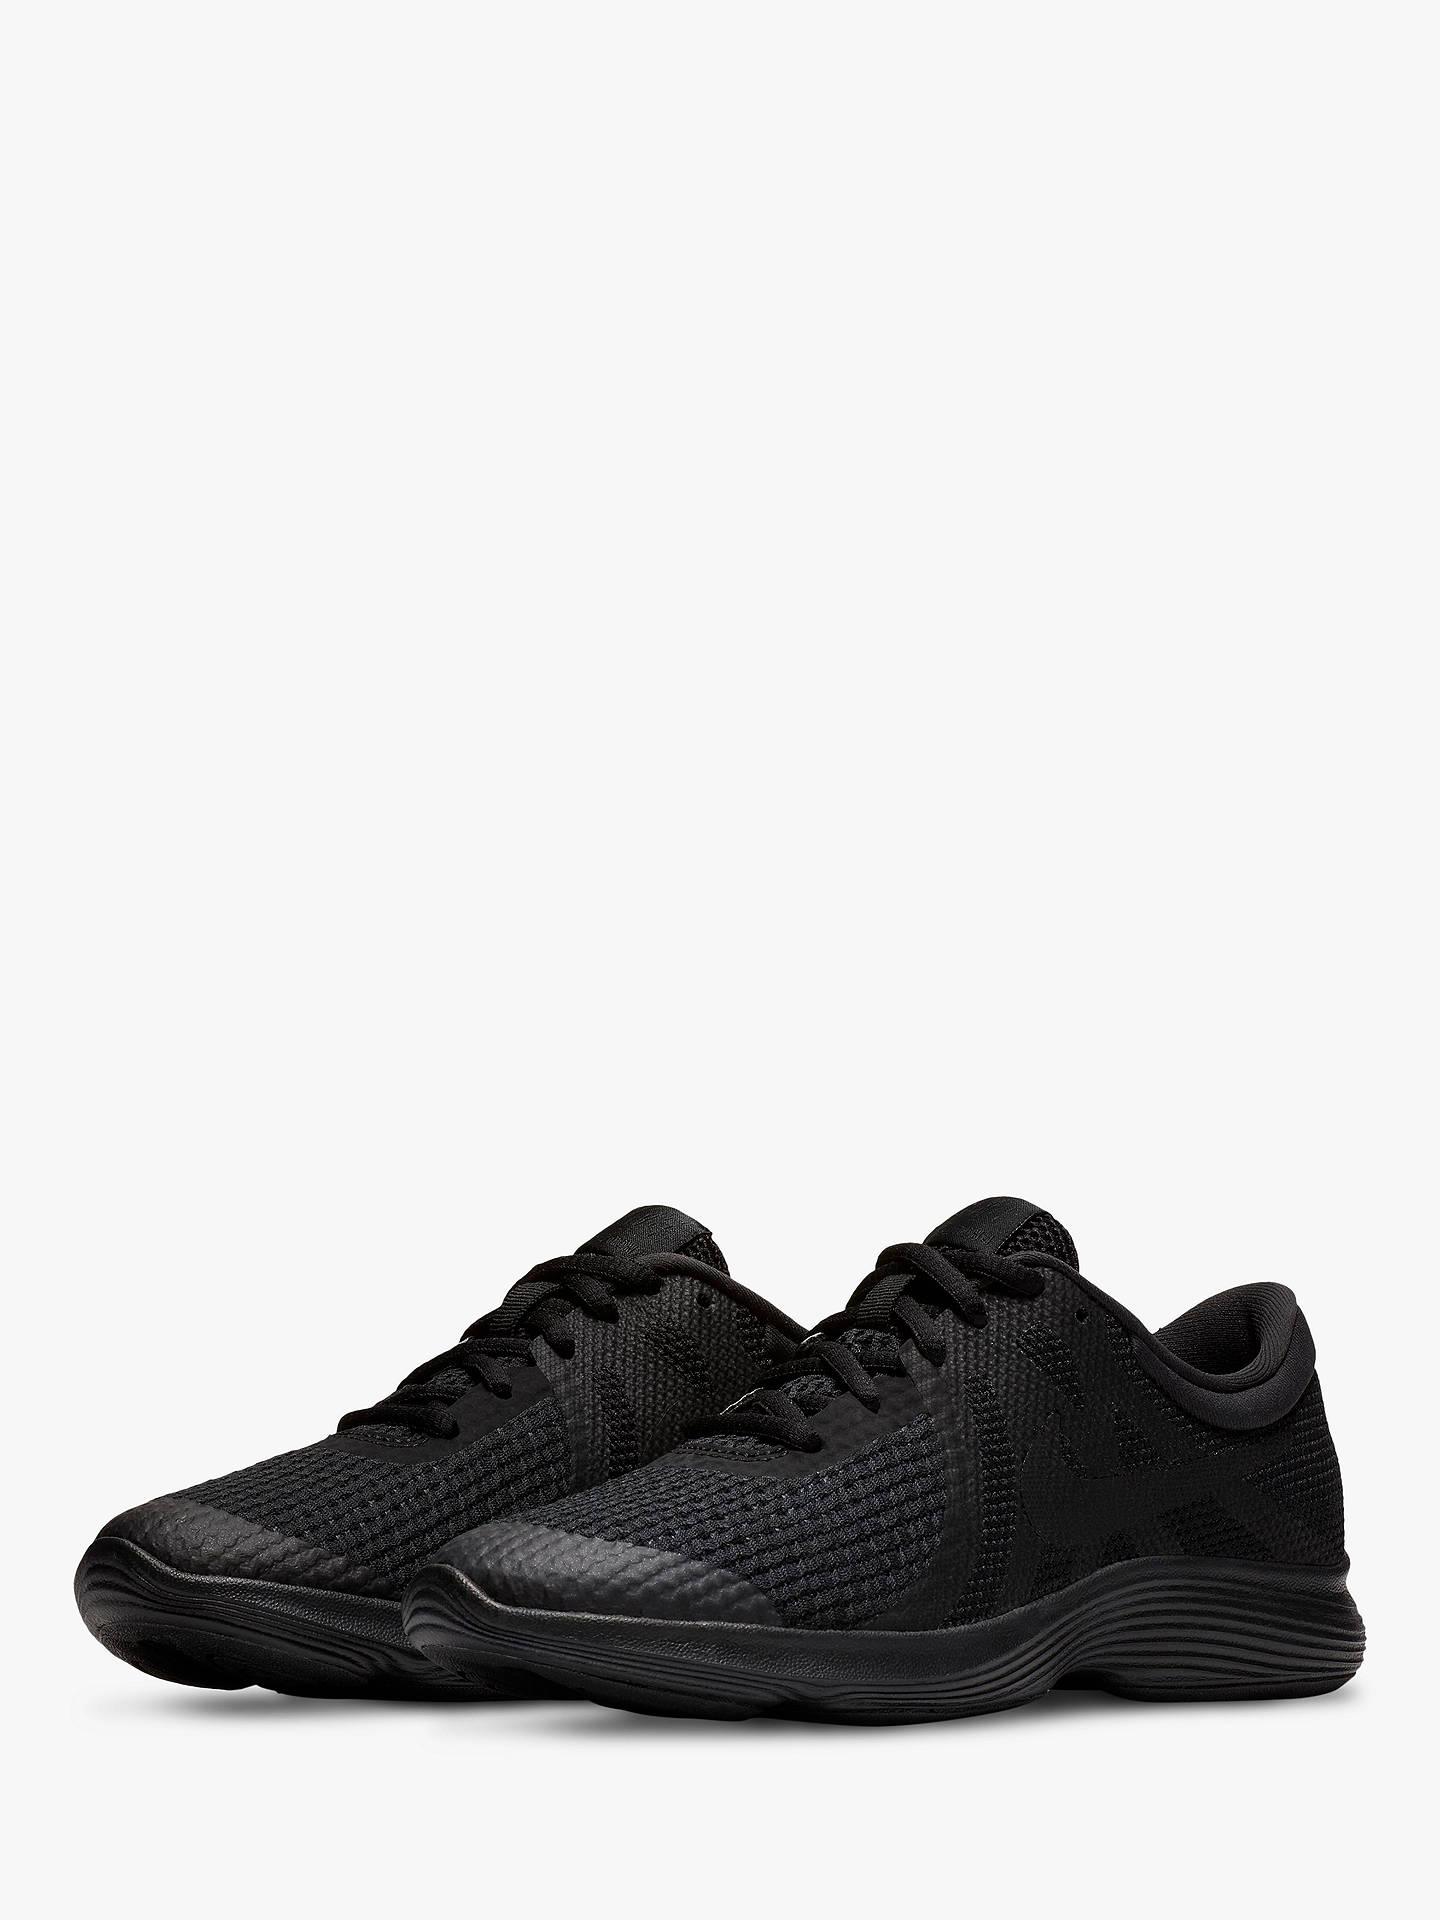 buy popular 9a873 212c6 ... Buy Nike Children s Revolution 4 Trainers, Black, 3 Online at johnlewis. com ...